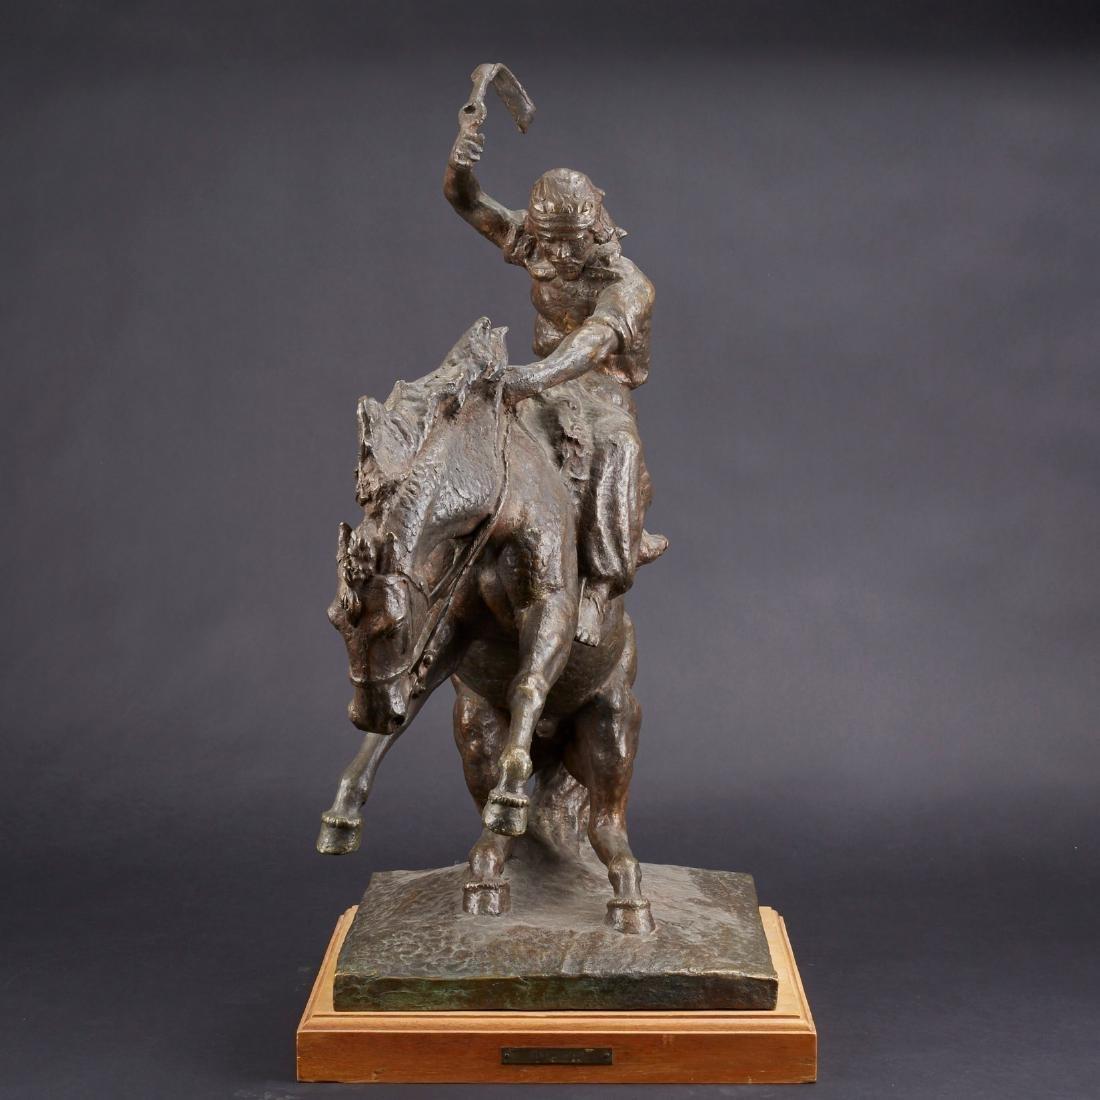 Jose Belloni Jineteando Bronze Sculpture - 2